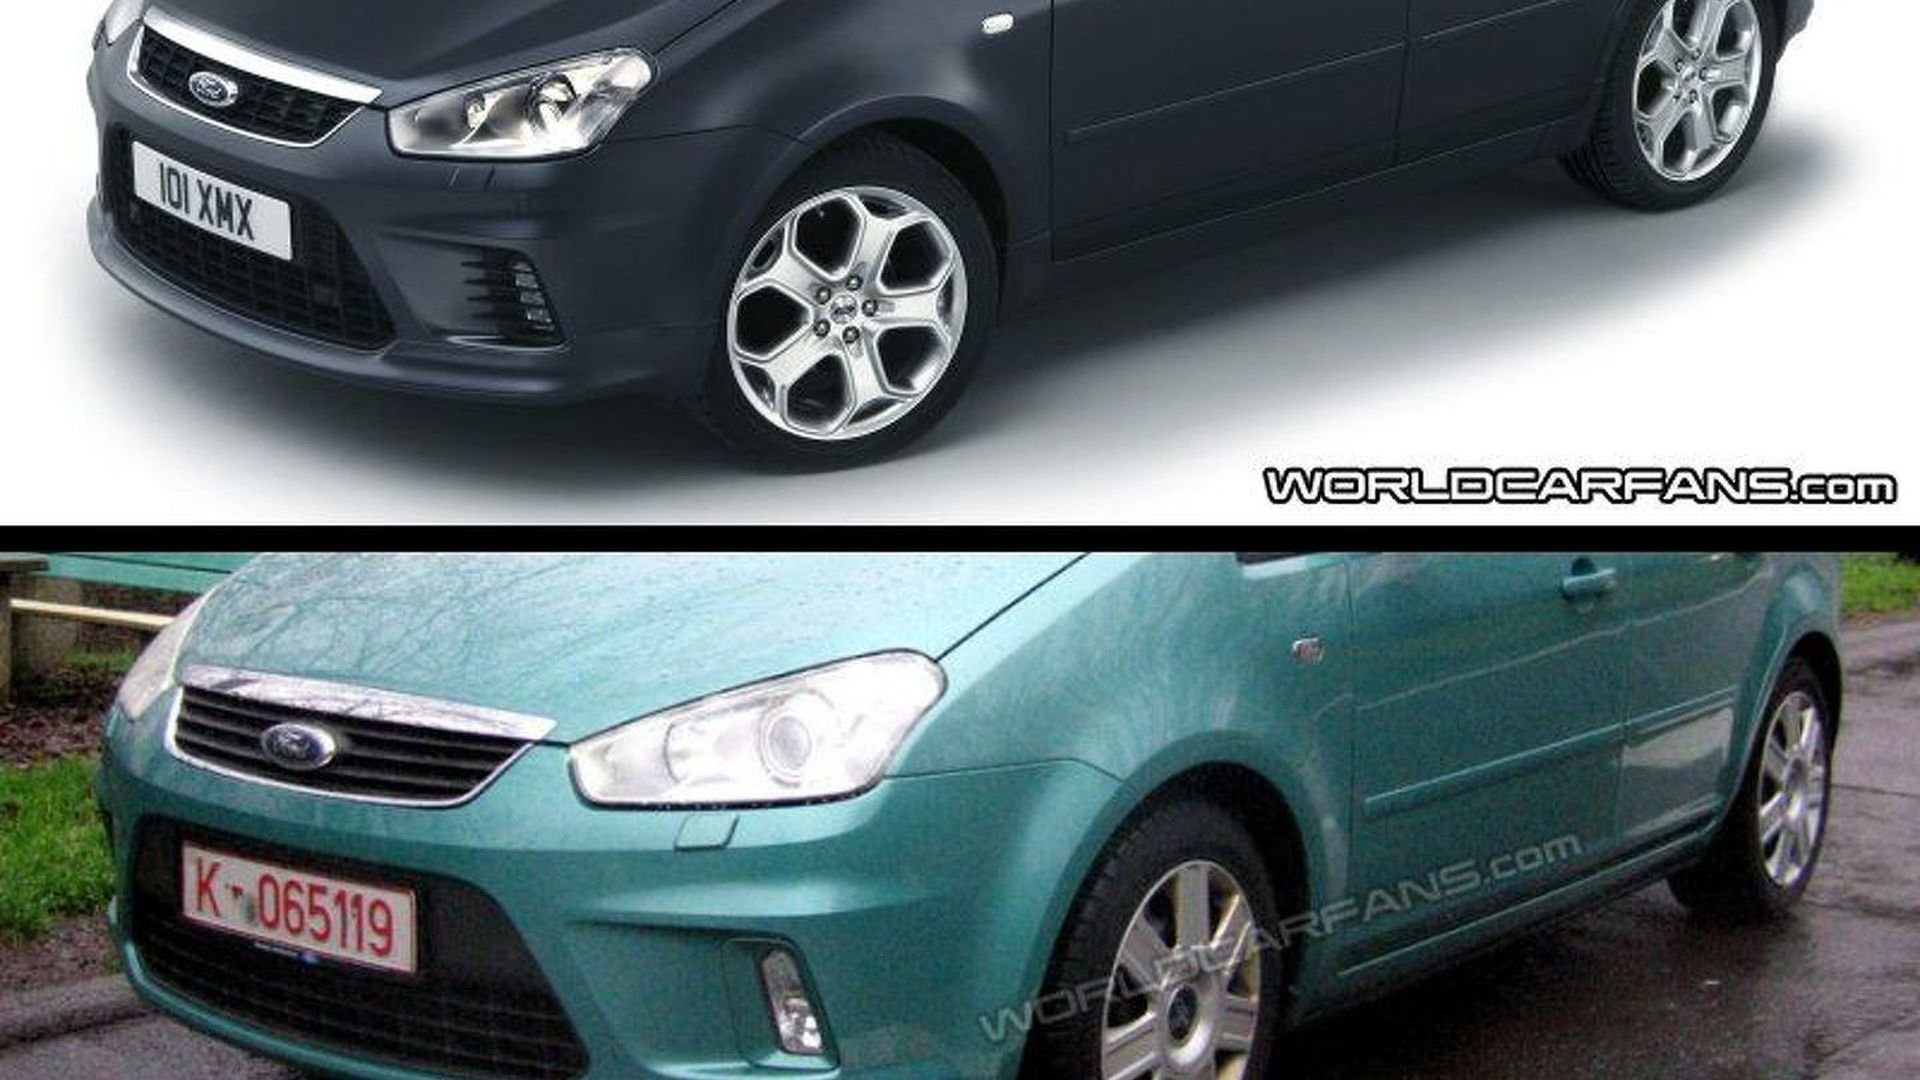 SPY PHOTOS: Ford C-Max Revised - Again